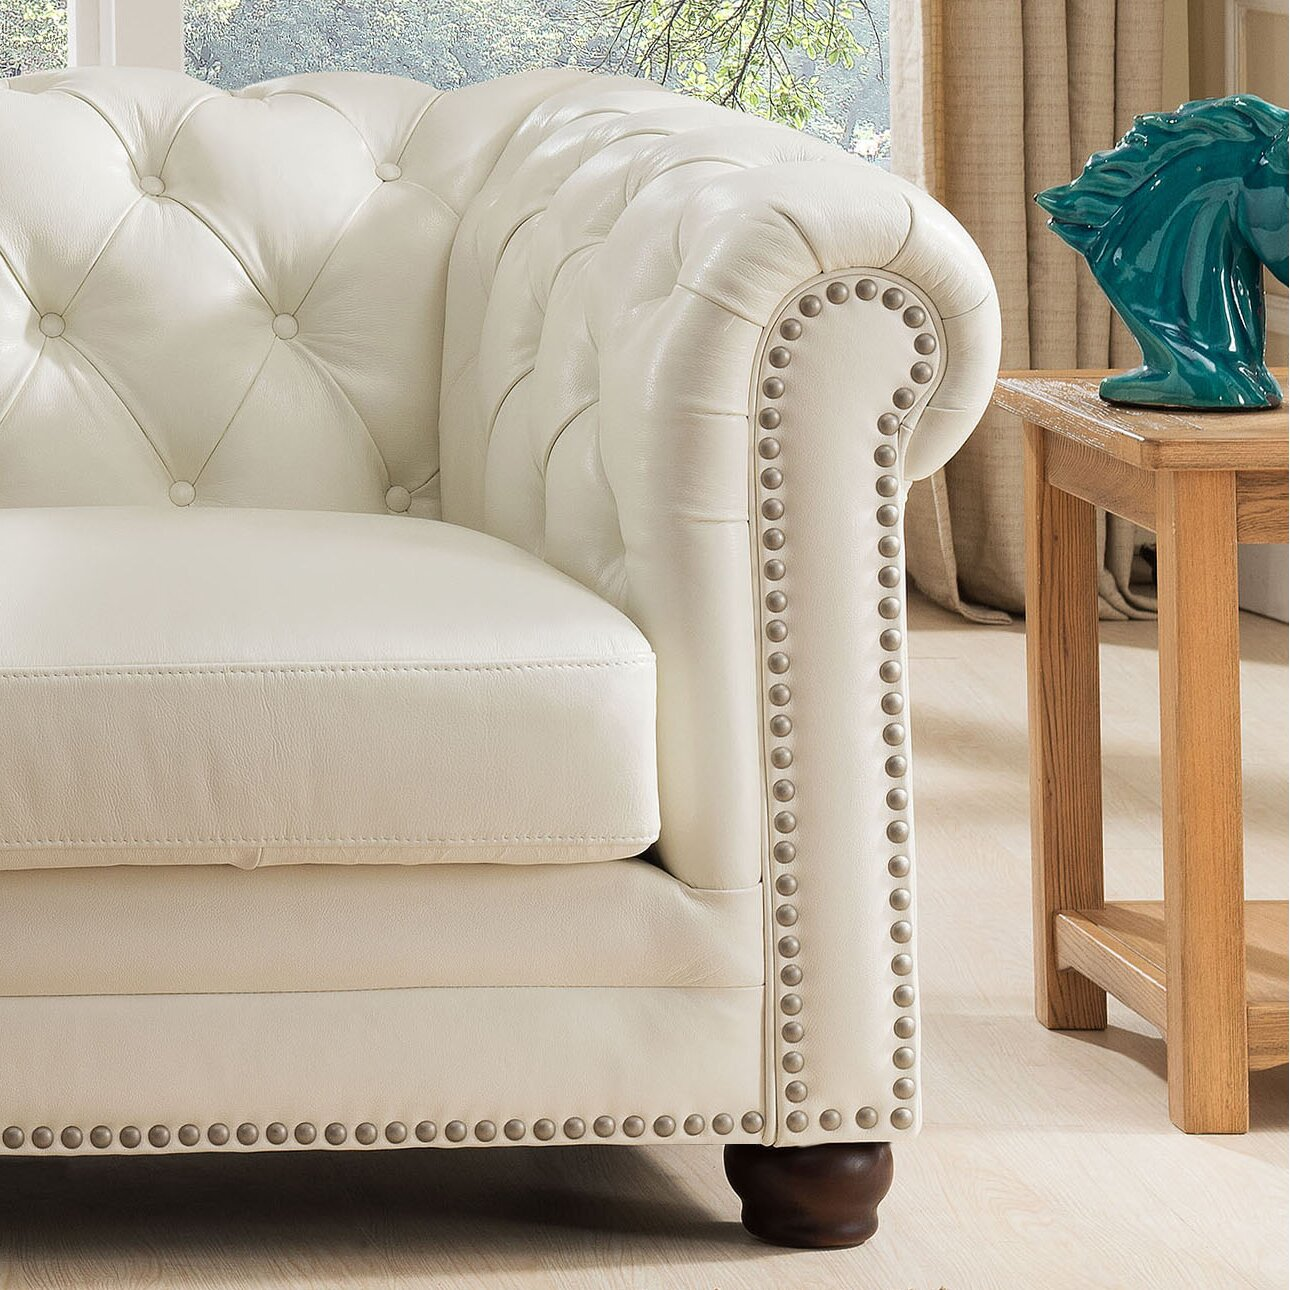 Amax Nashville Leather Sofa And Loveseat Set Reviews Wayfair